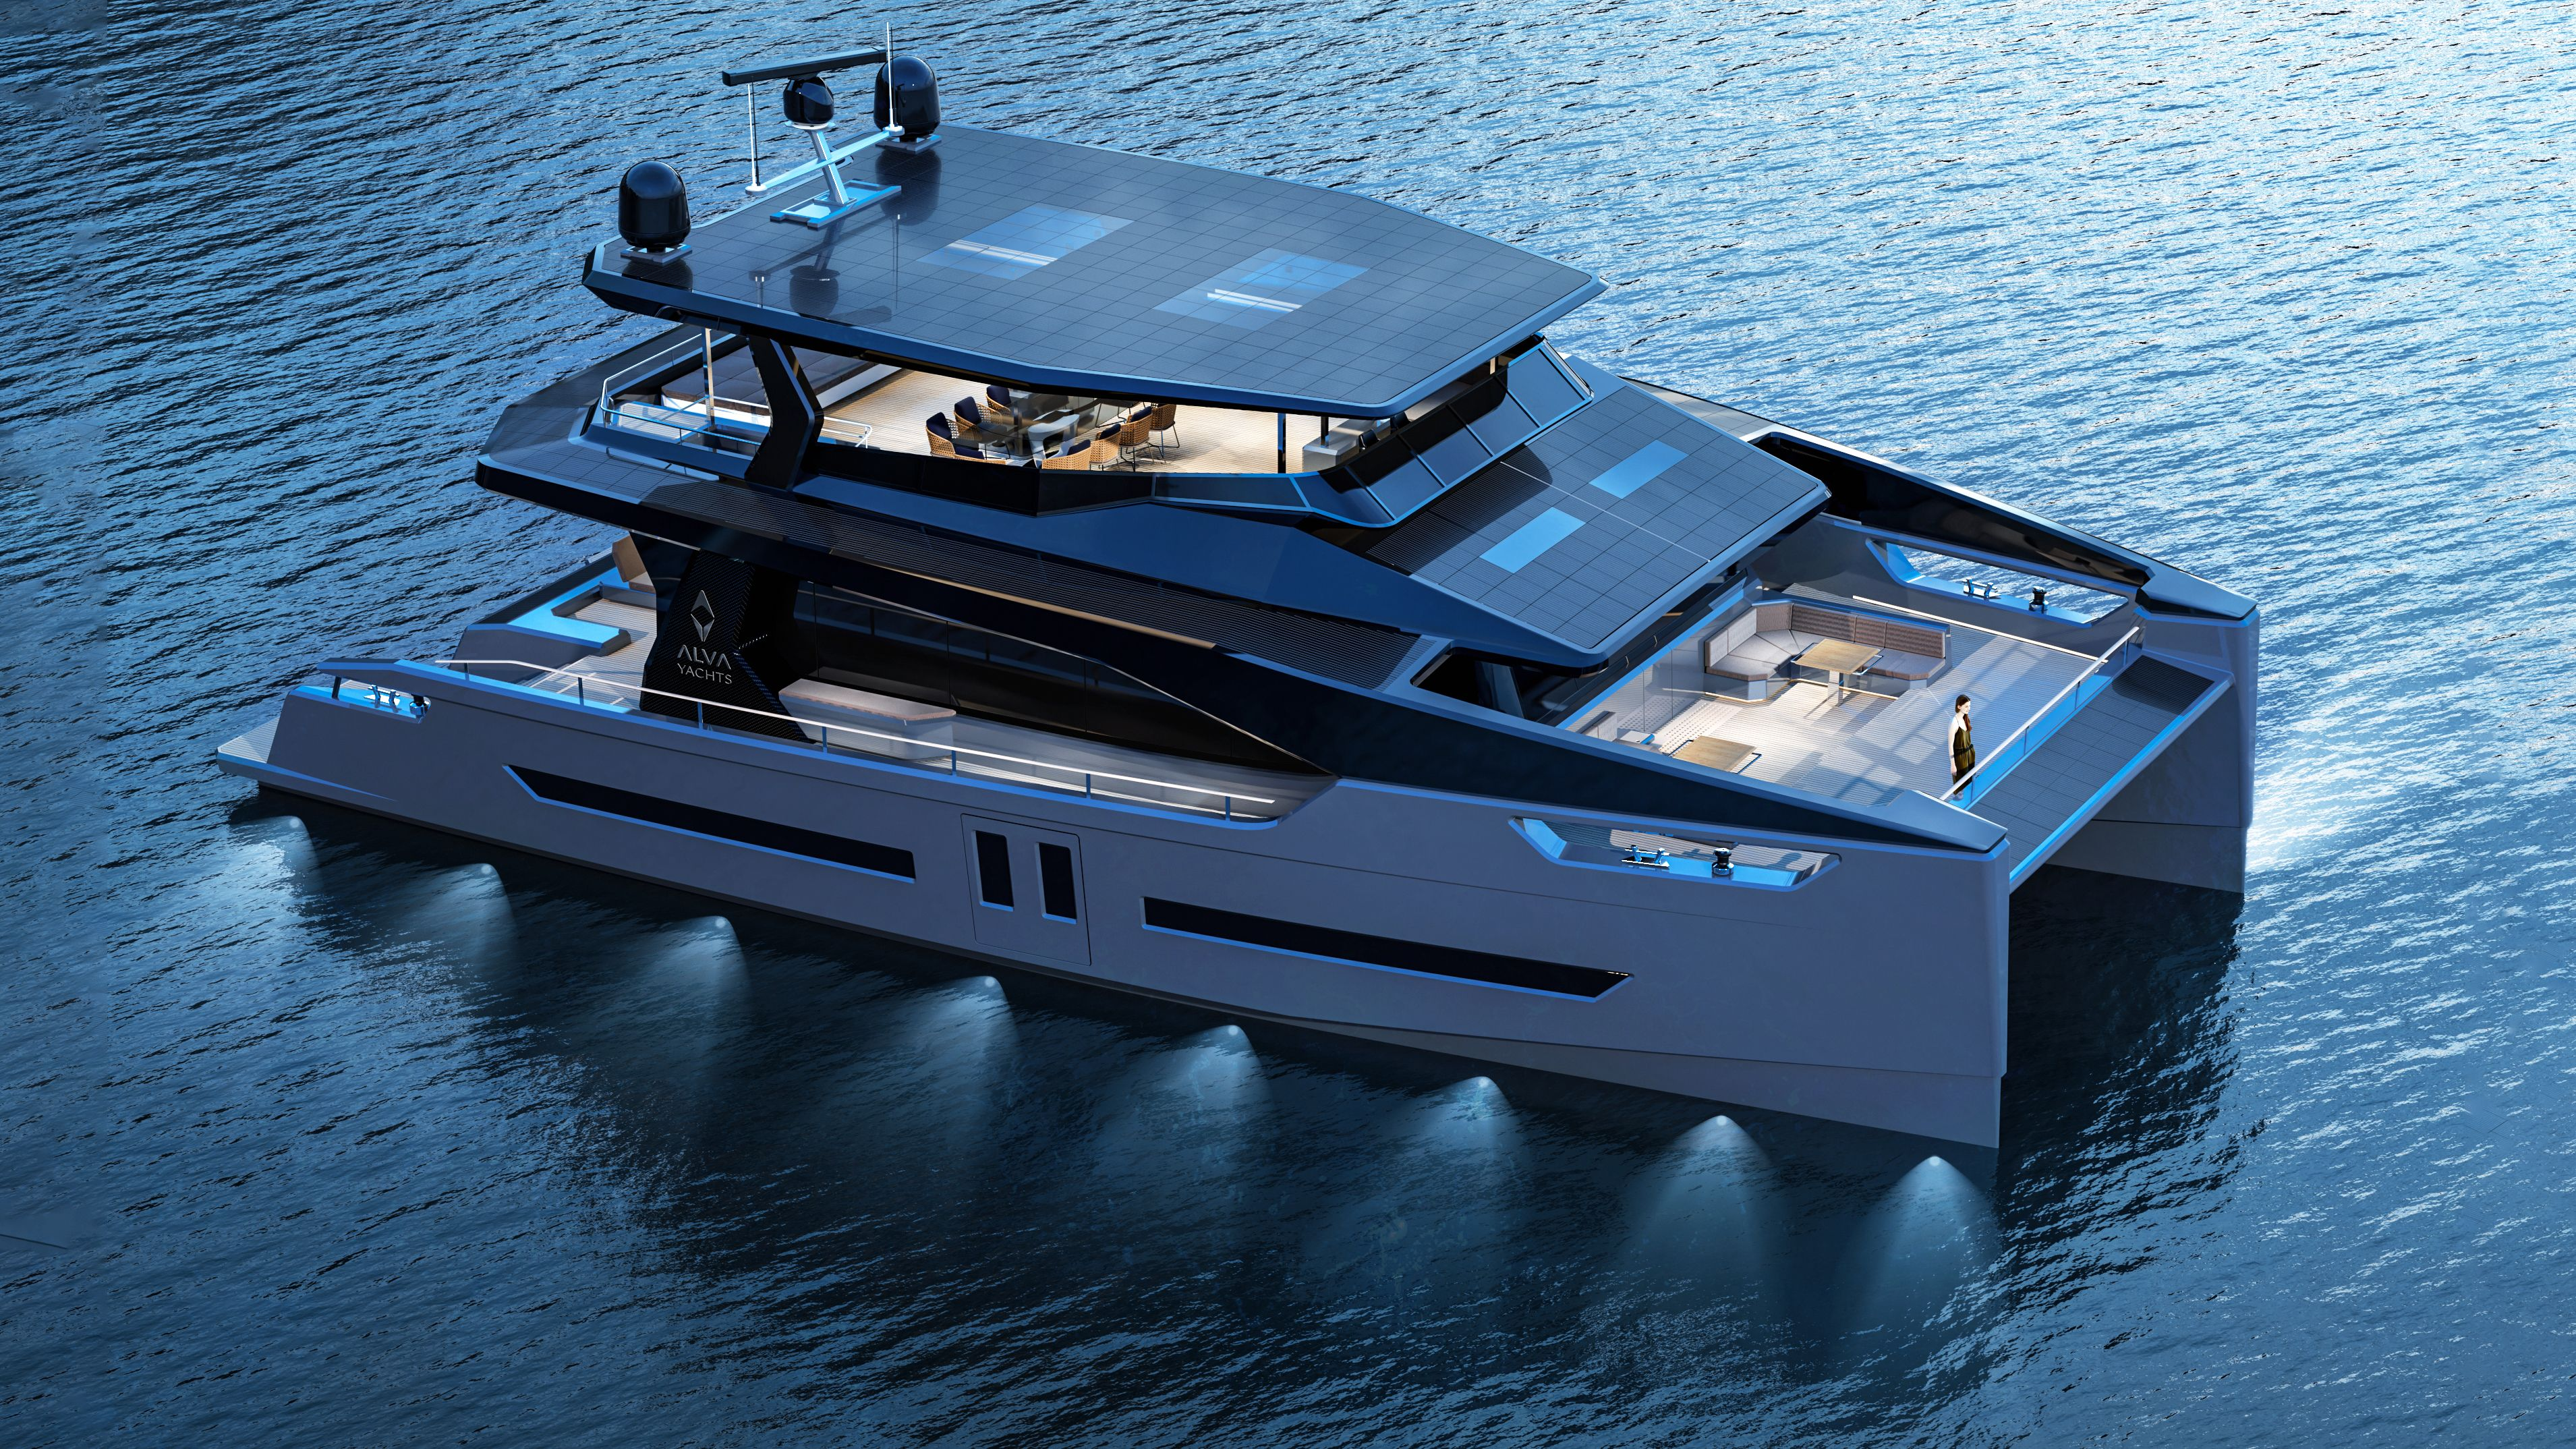 yacht concept, catamaran, luxury yacht